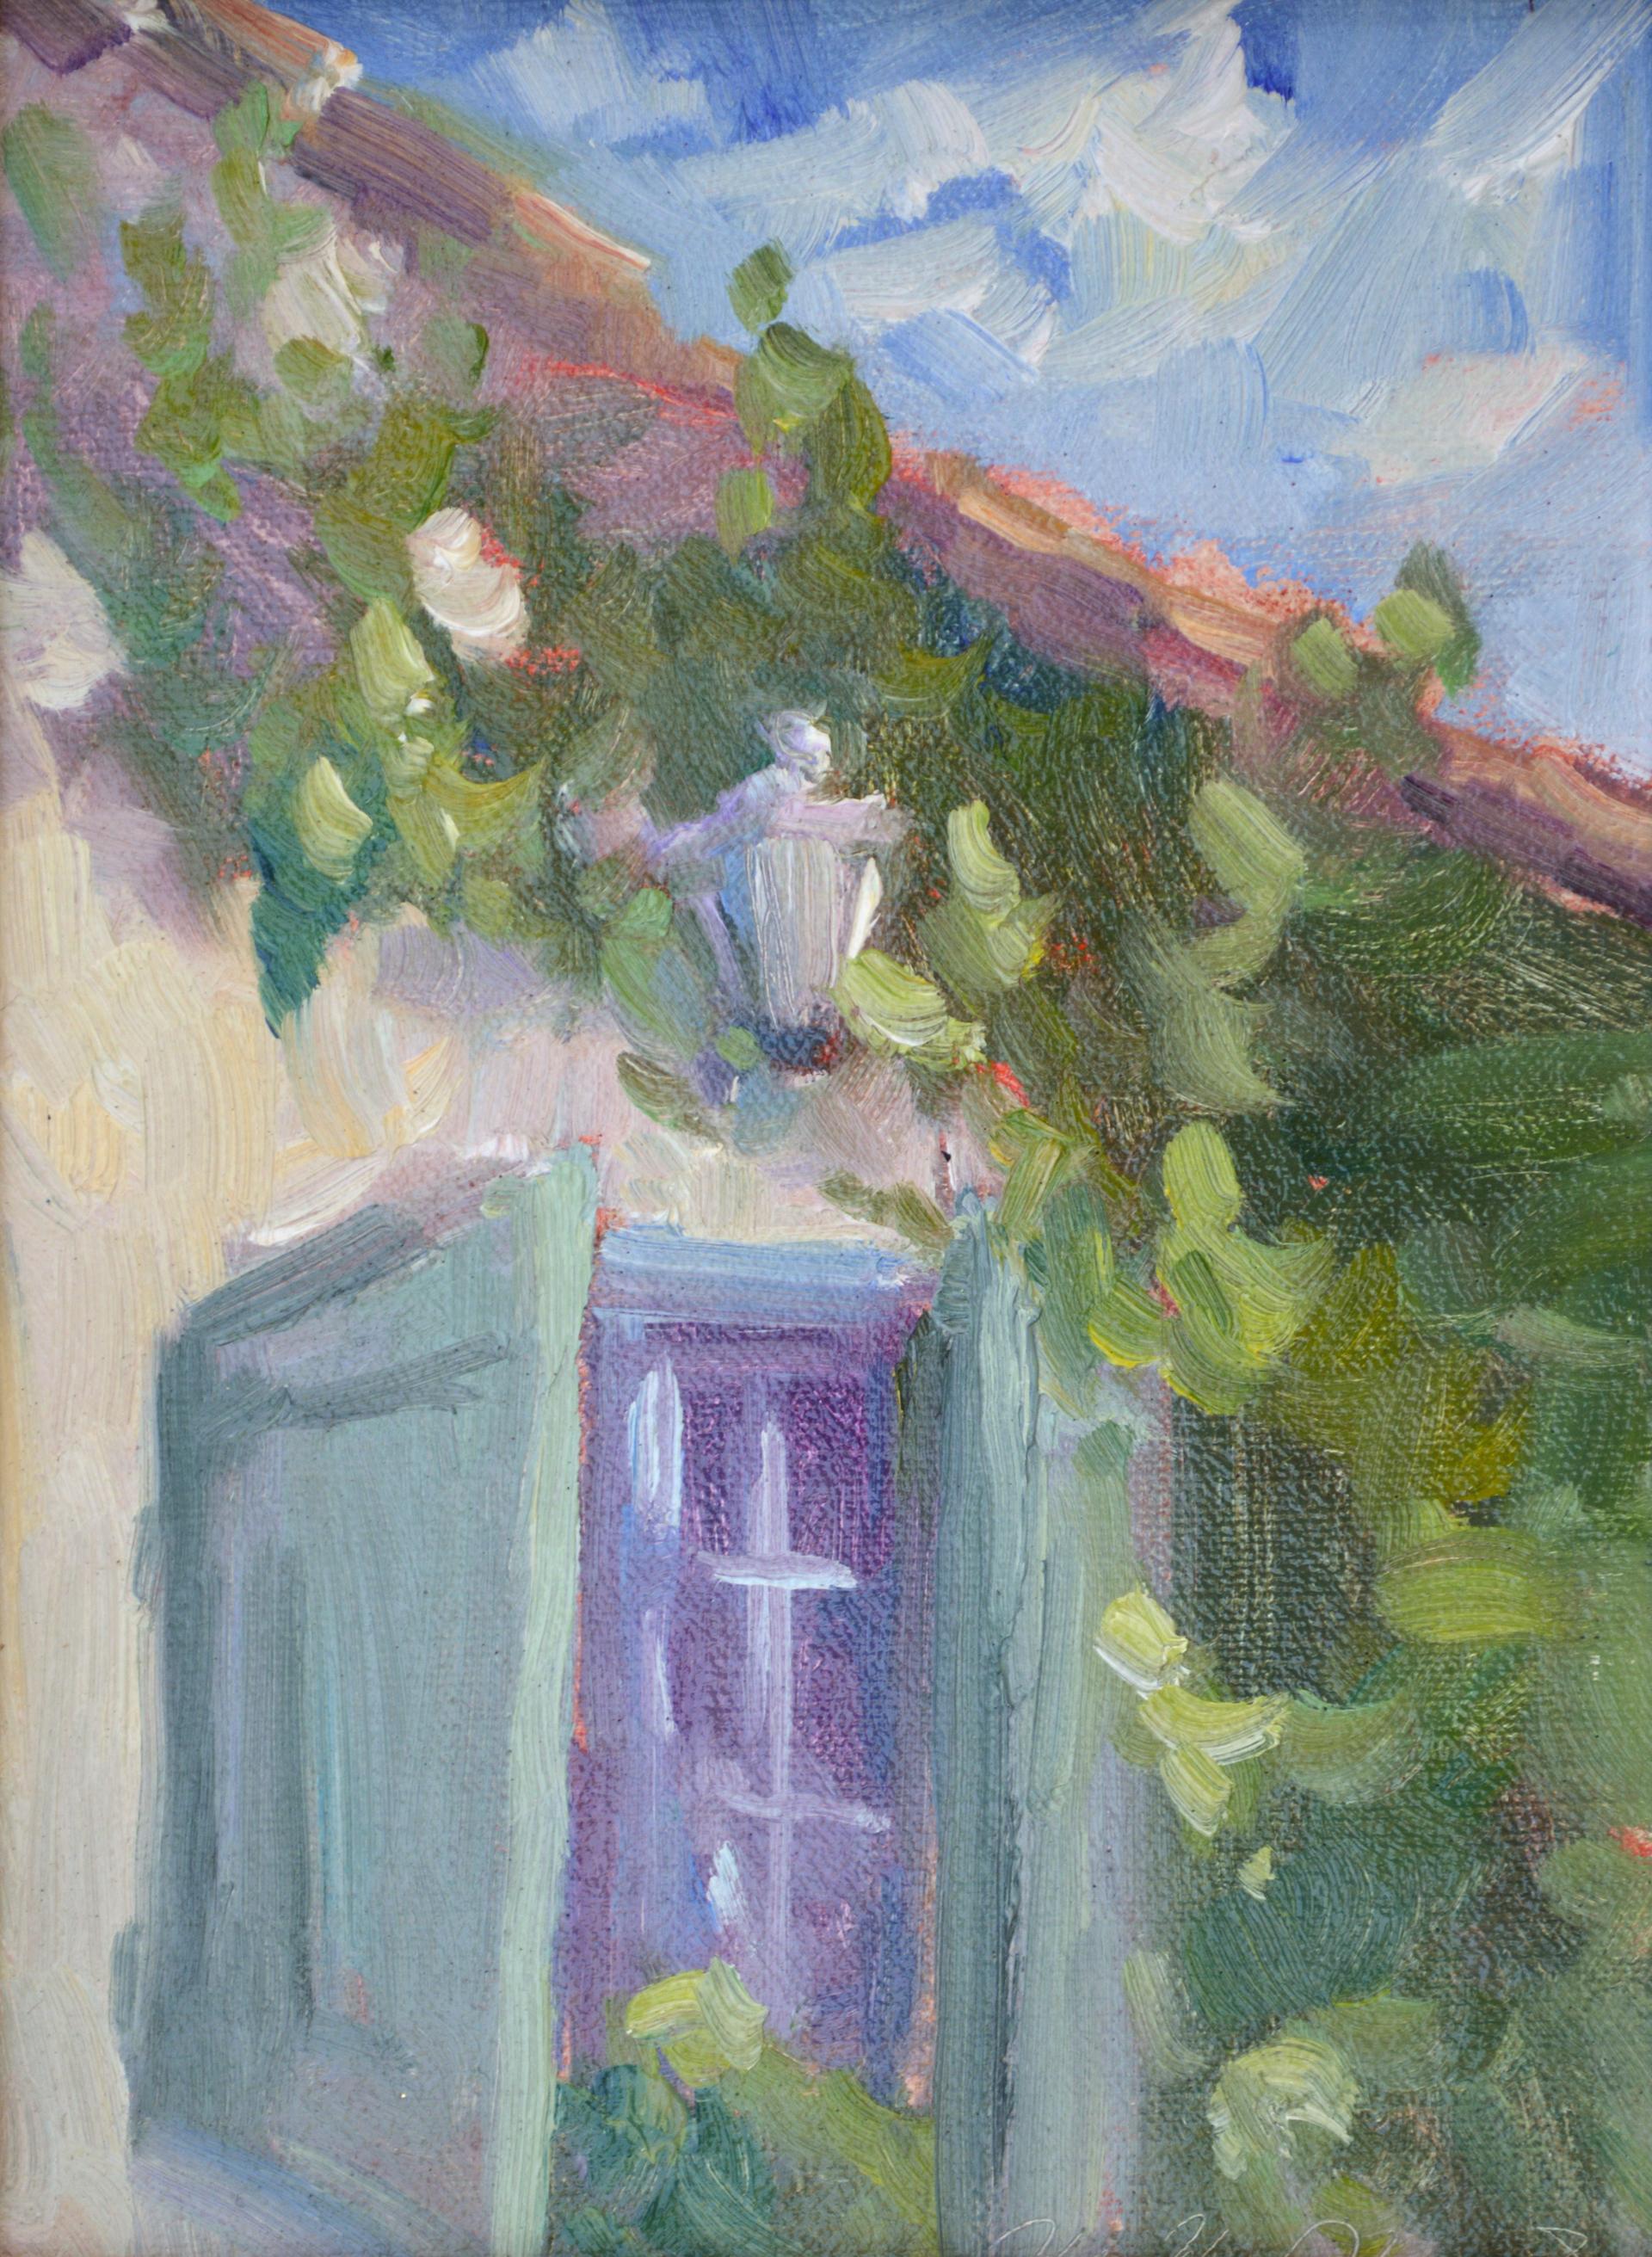 French Window at Domas Alba by Karen Hewitt Hagan